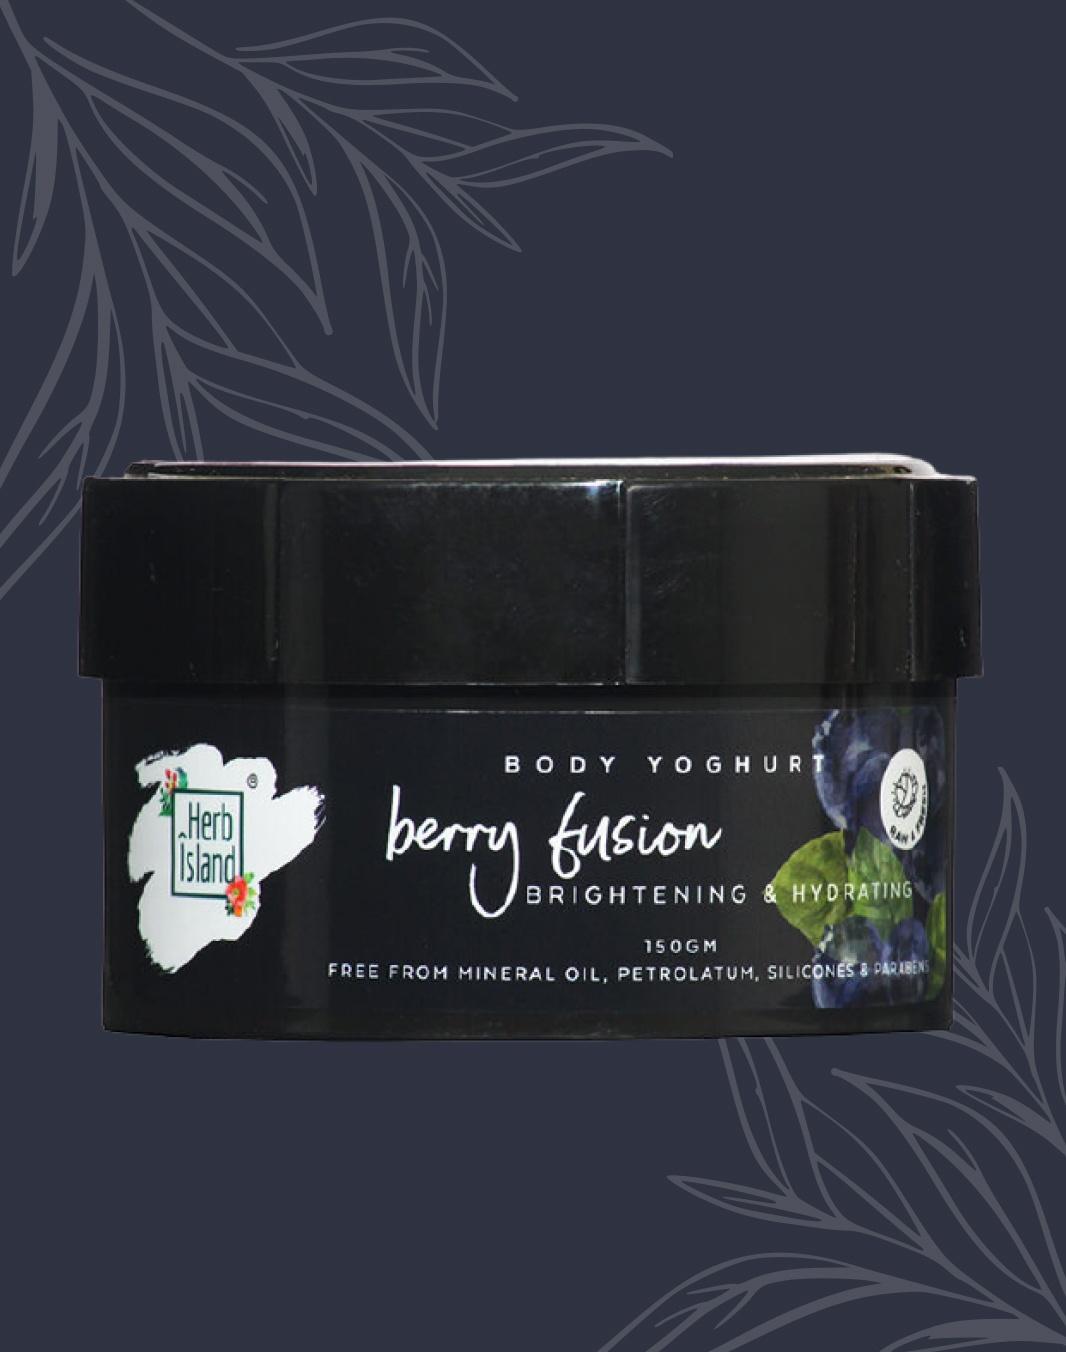 Berry Fusion Body Yoghurt